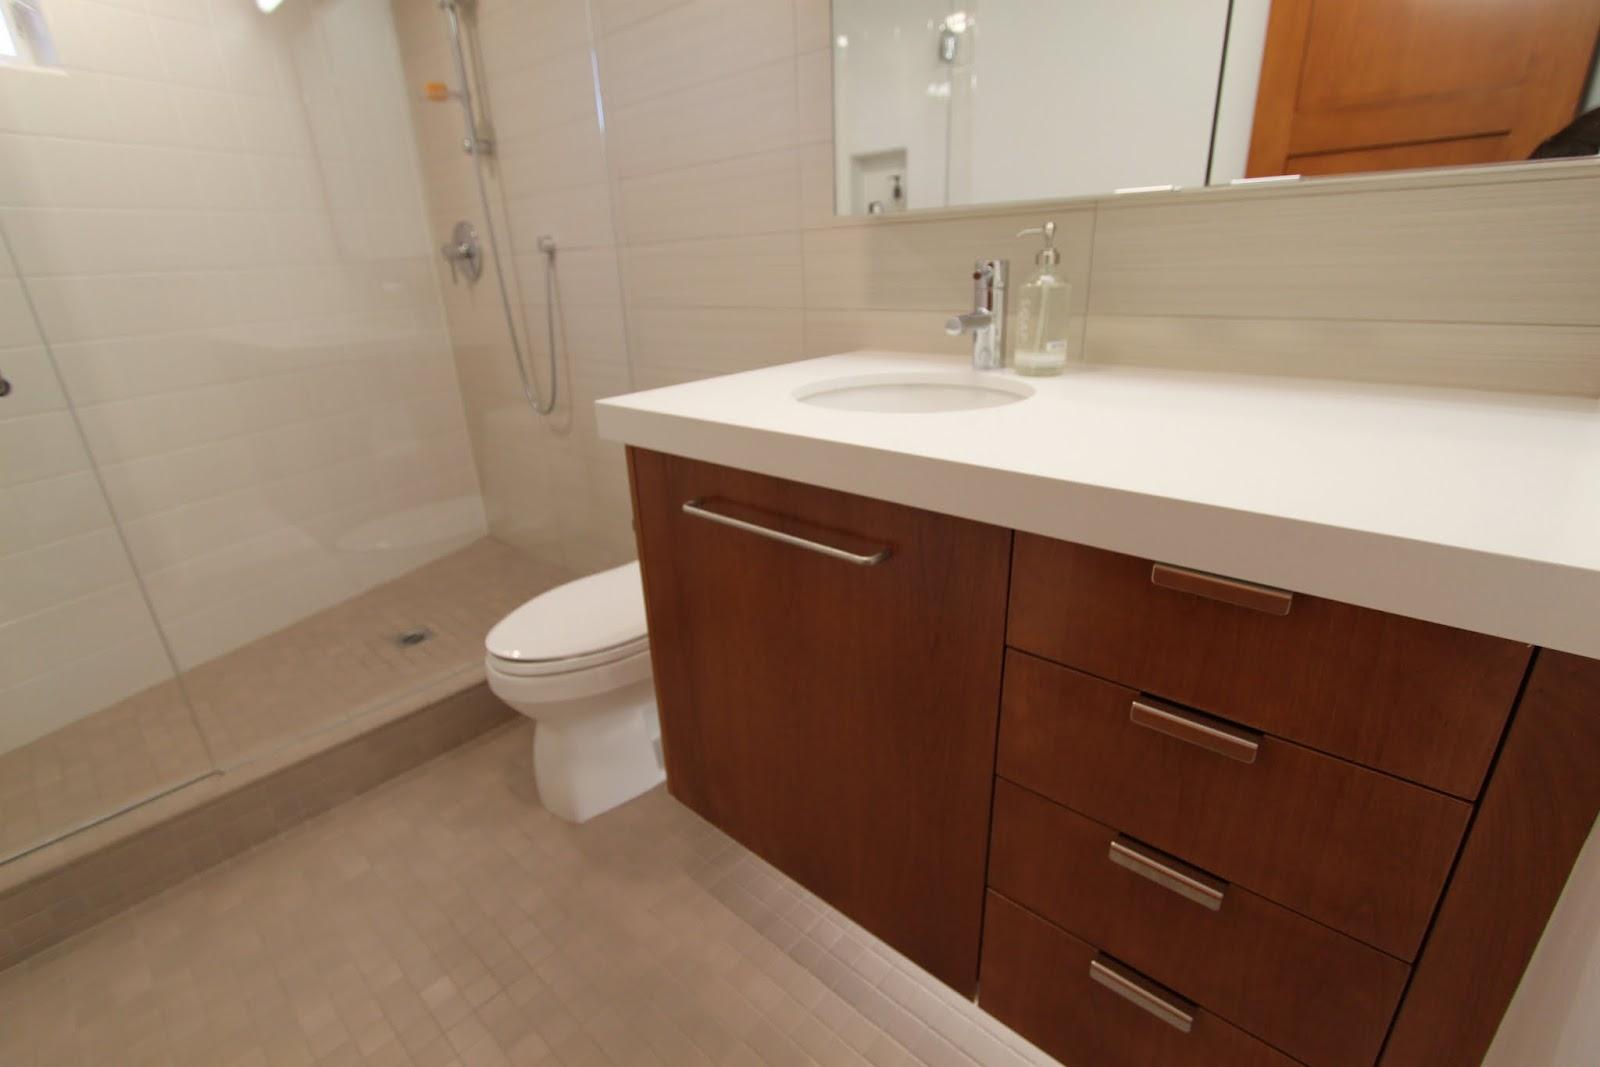 Mid Century Modern Vanity Upgrades Every Bathroom With